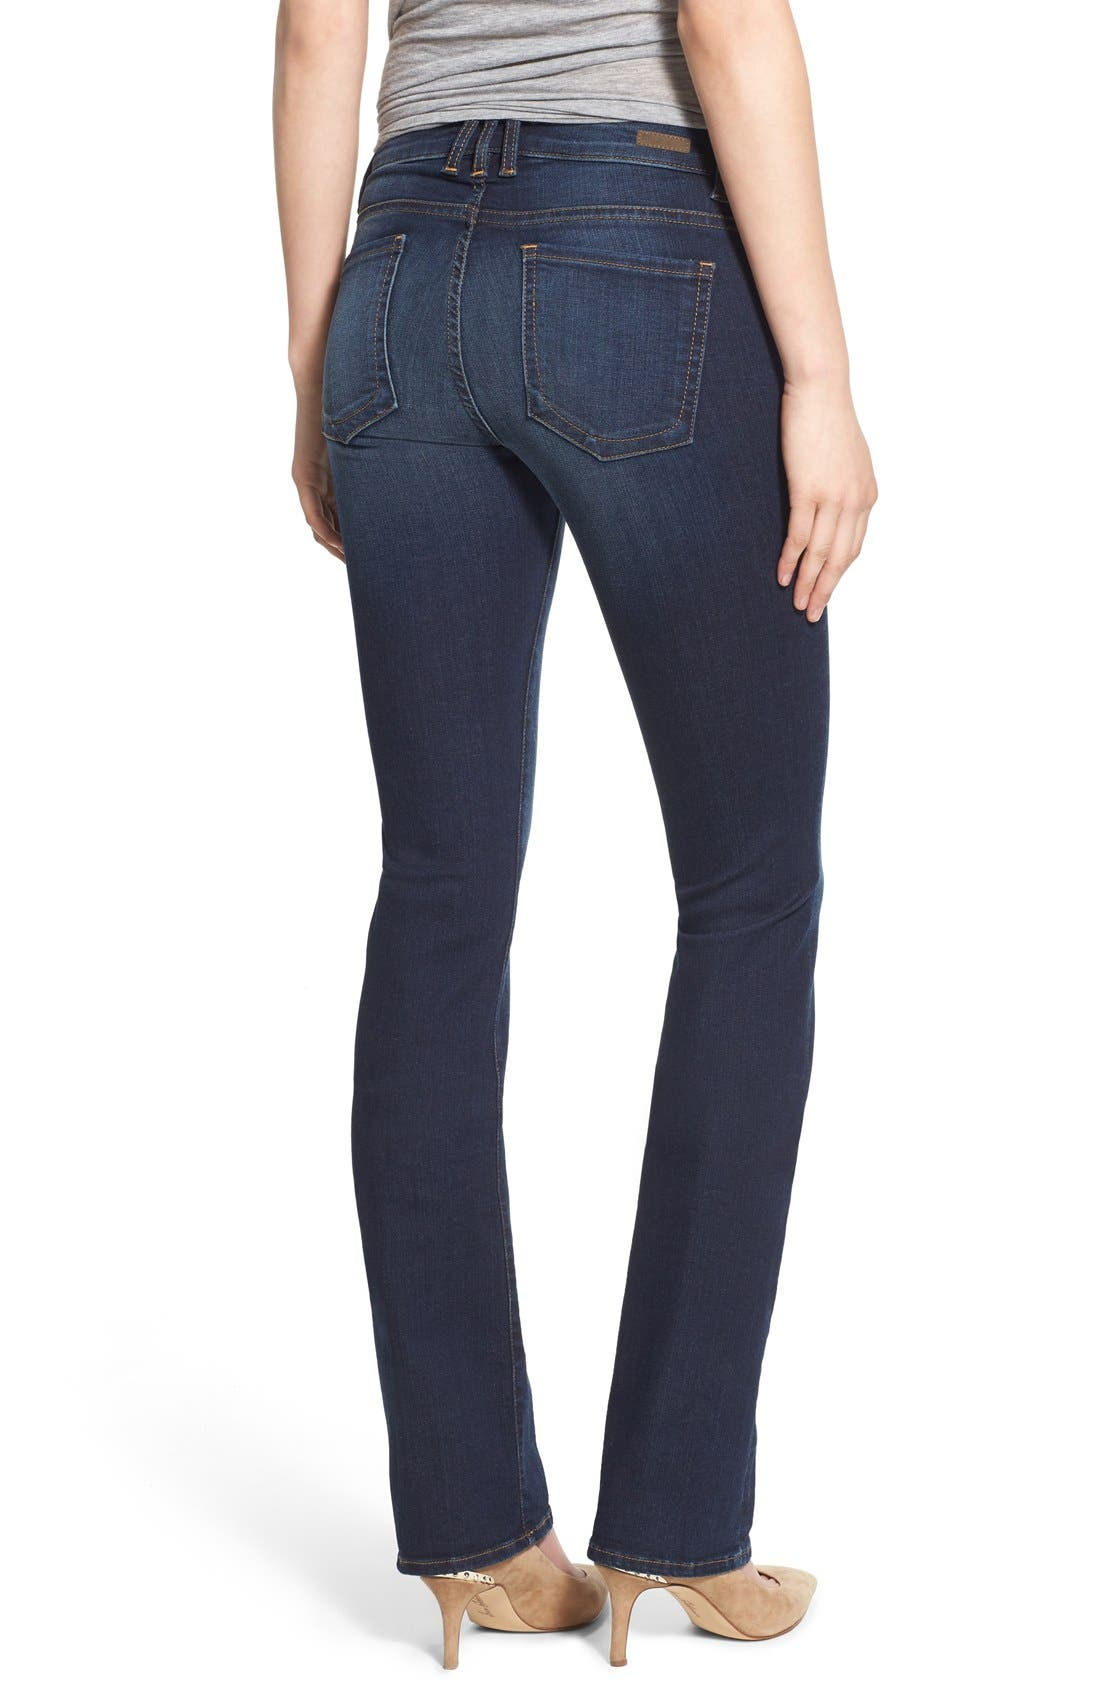 'Natalie' Stretch Bootleg Jeans,                             Alternate thumbnail 6, color,                             401